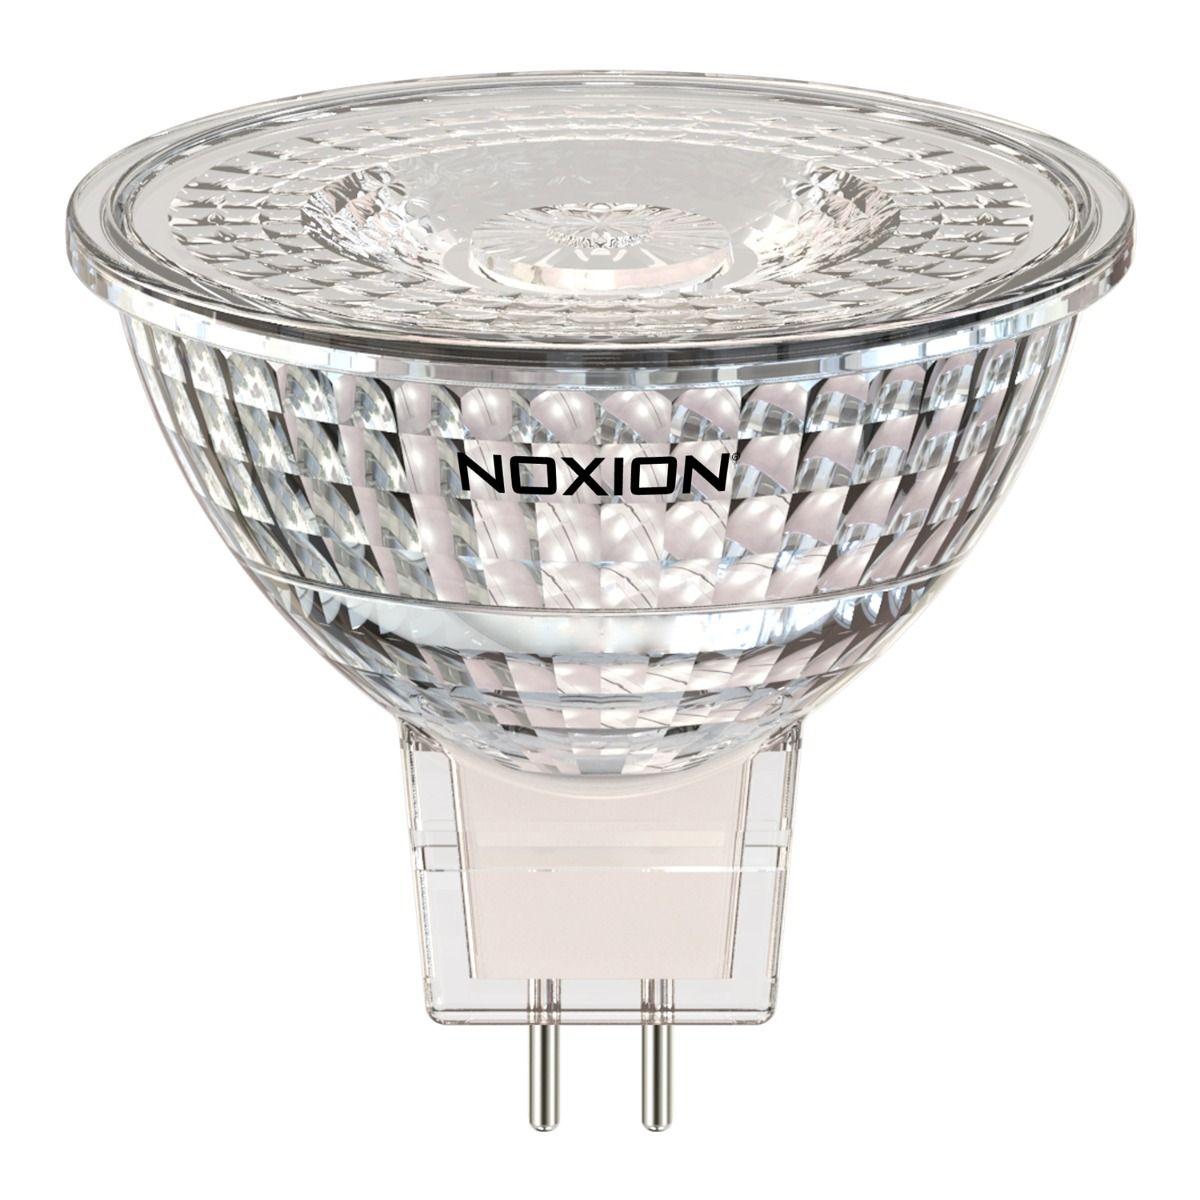 Noxion LED Spot GU5.3 3.2W 827 36D 270lm   Vervanger voor 20W